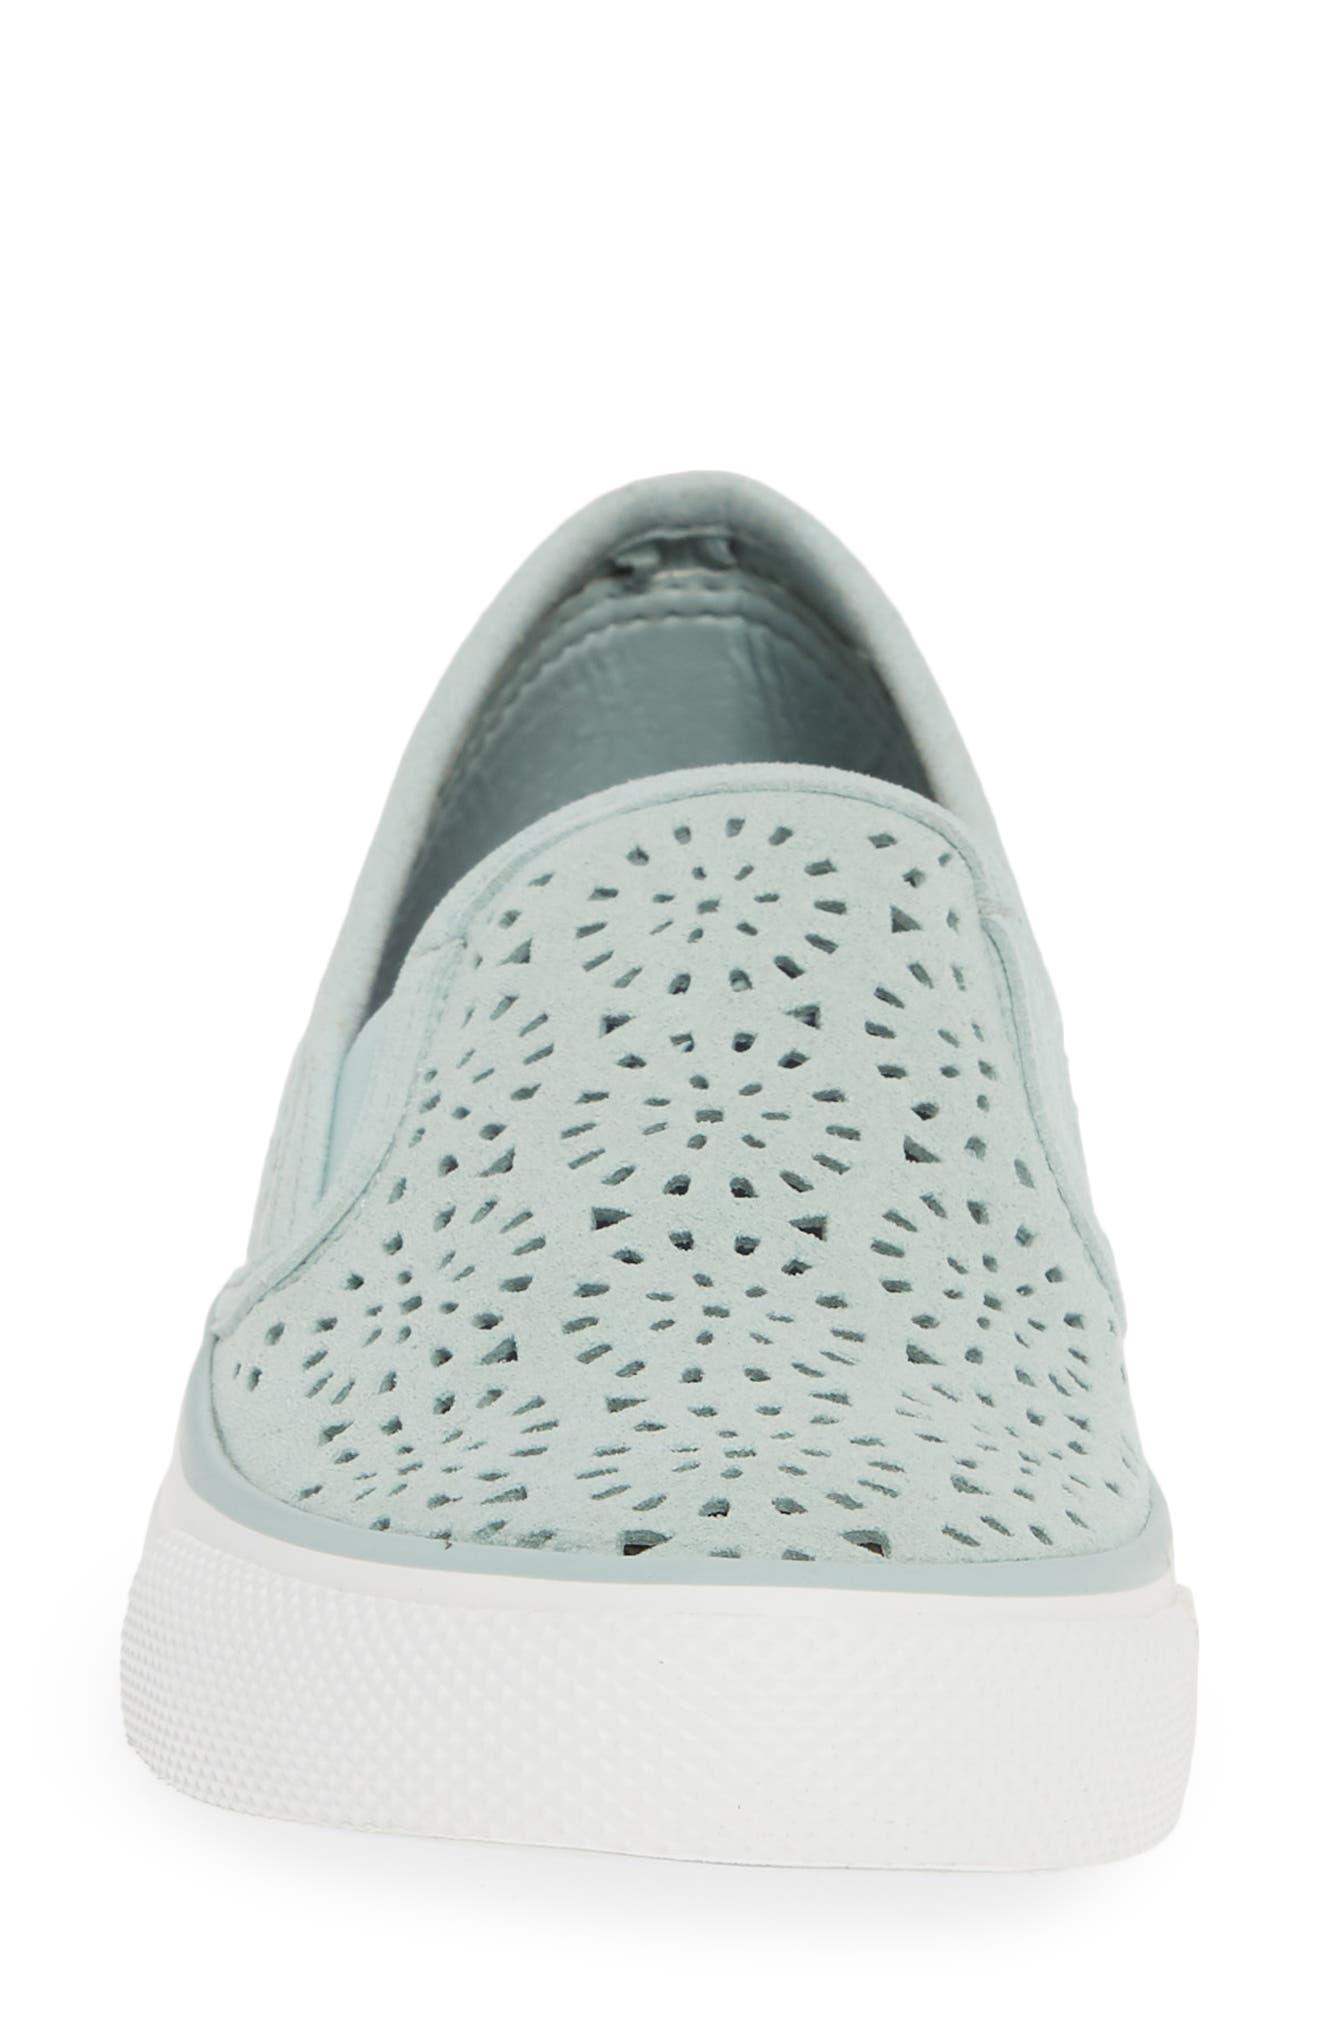 Seaside Nautical Perforated Slip-On Sneaker,                             Alternate thumbnail 4, color,                             MINT NUBUCK LEATHER